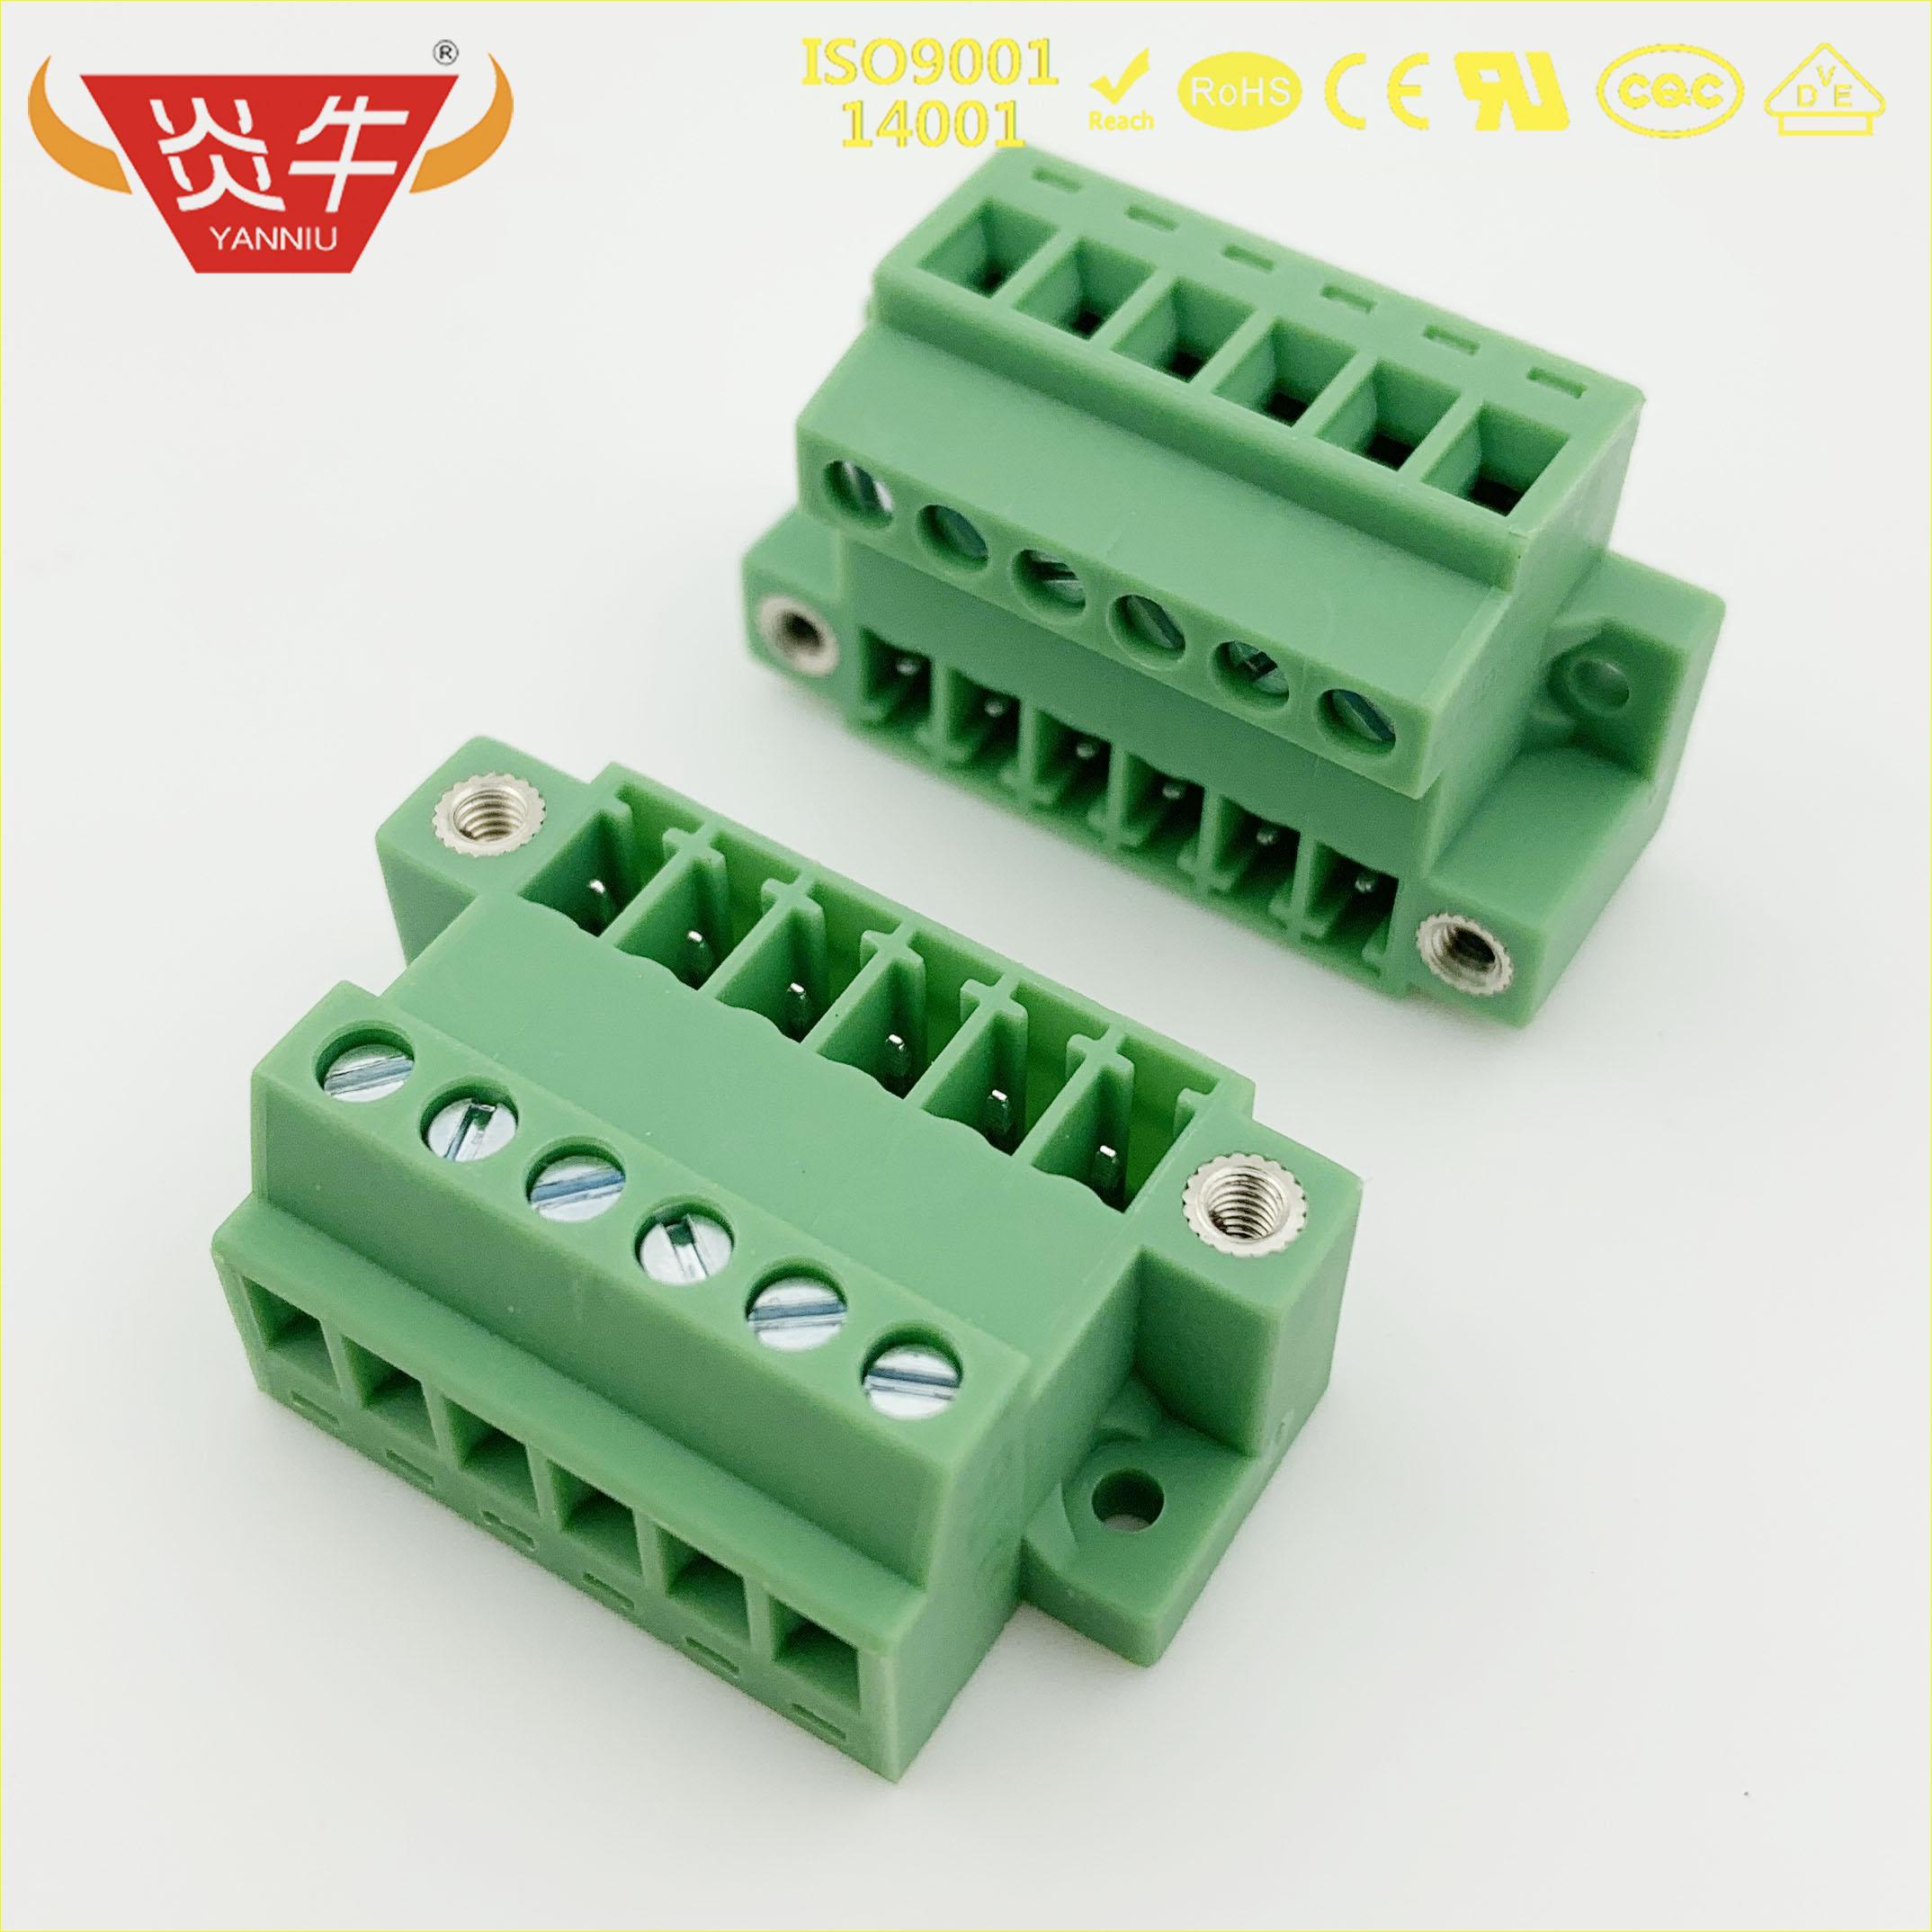 Bloques teminales KF2EDG GBM 3,81 2P ~ 12P PCB enchufables 15EDG-GBM 3,81mm 2PIN ~ 12PIN mcvus 1,5/2-GFD-3, 81-1833027 contacto Fénix